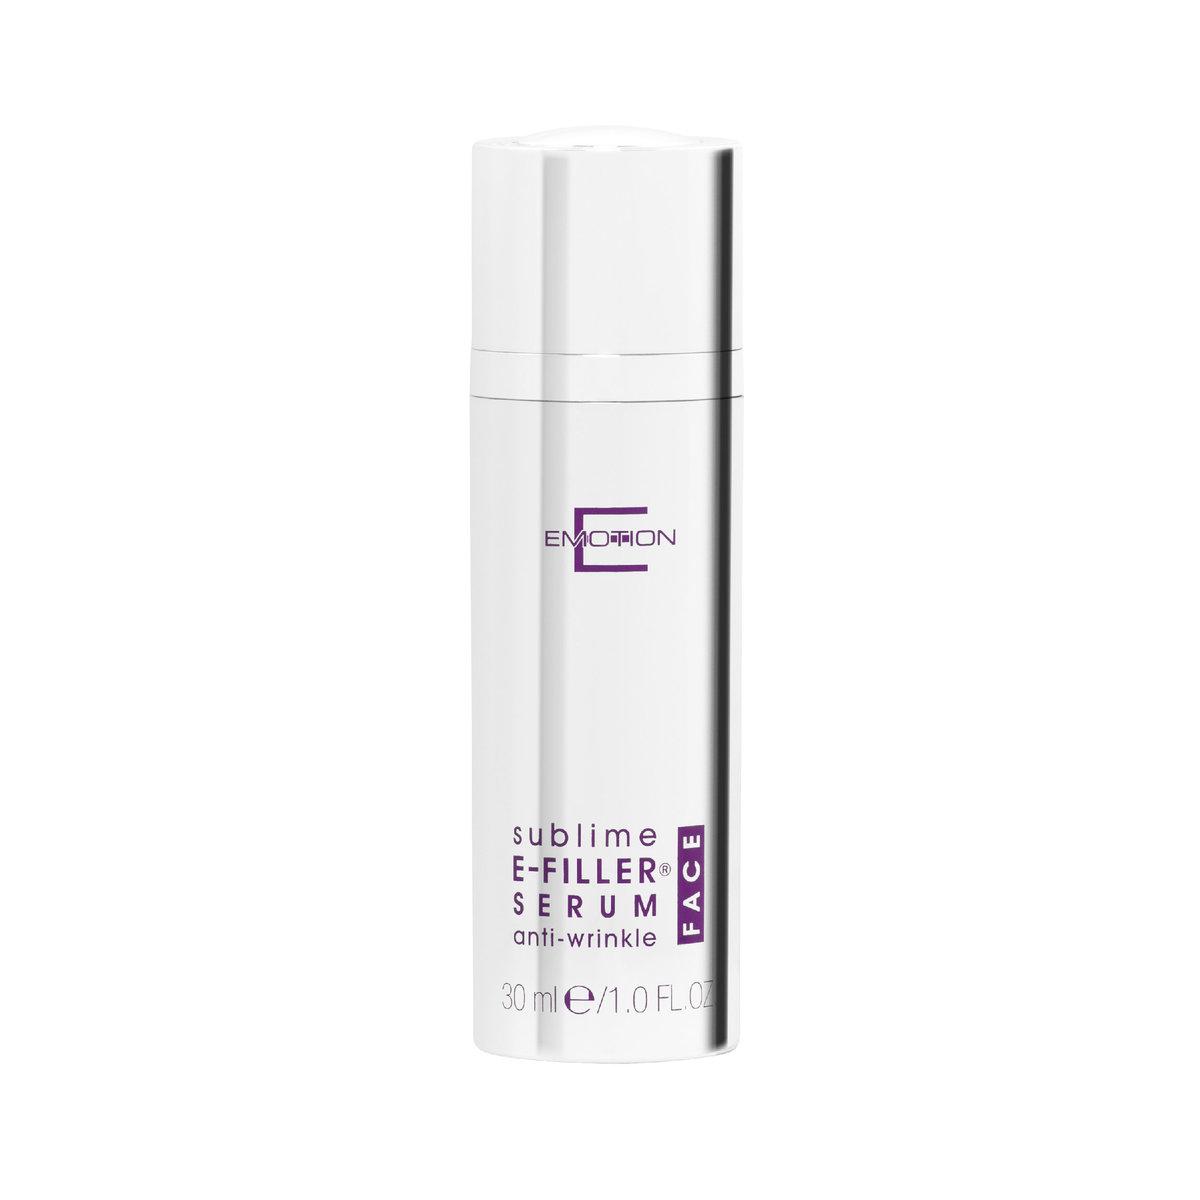 E-Filler® Anti-wrinkle Face Serum  (Best Use Date: 29/02/2020)